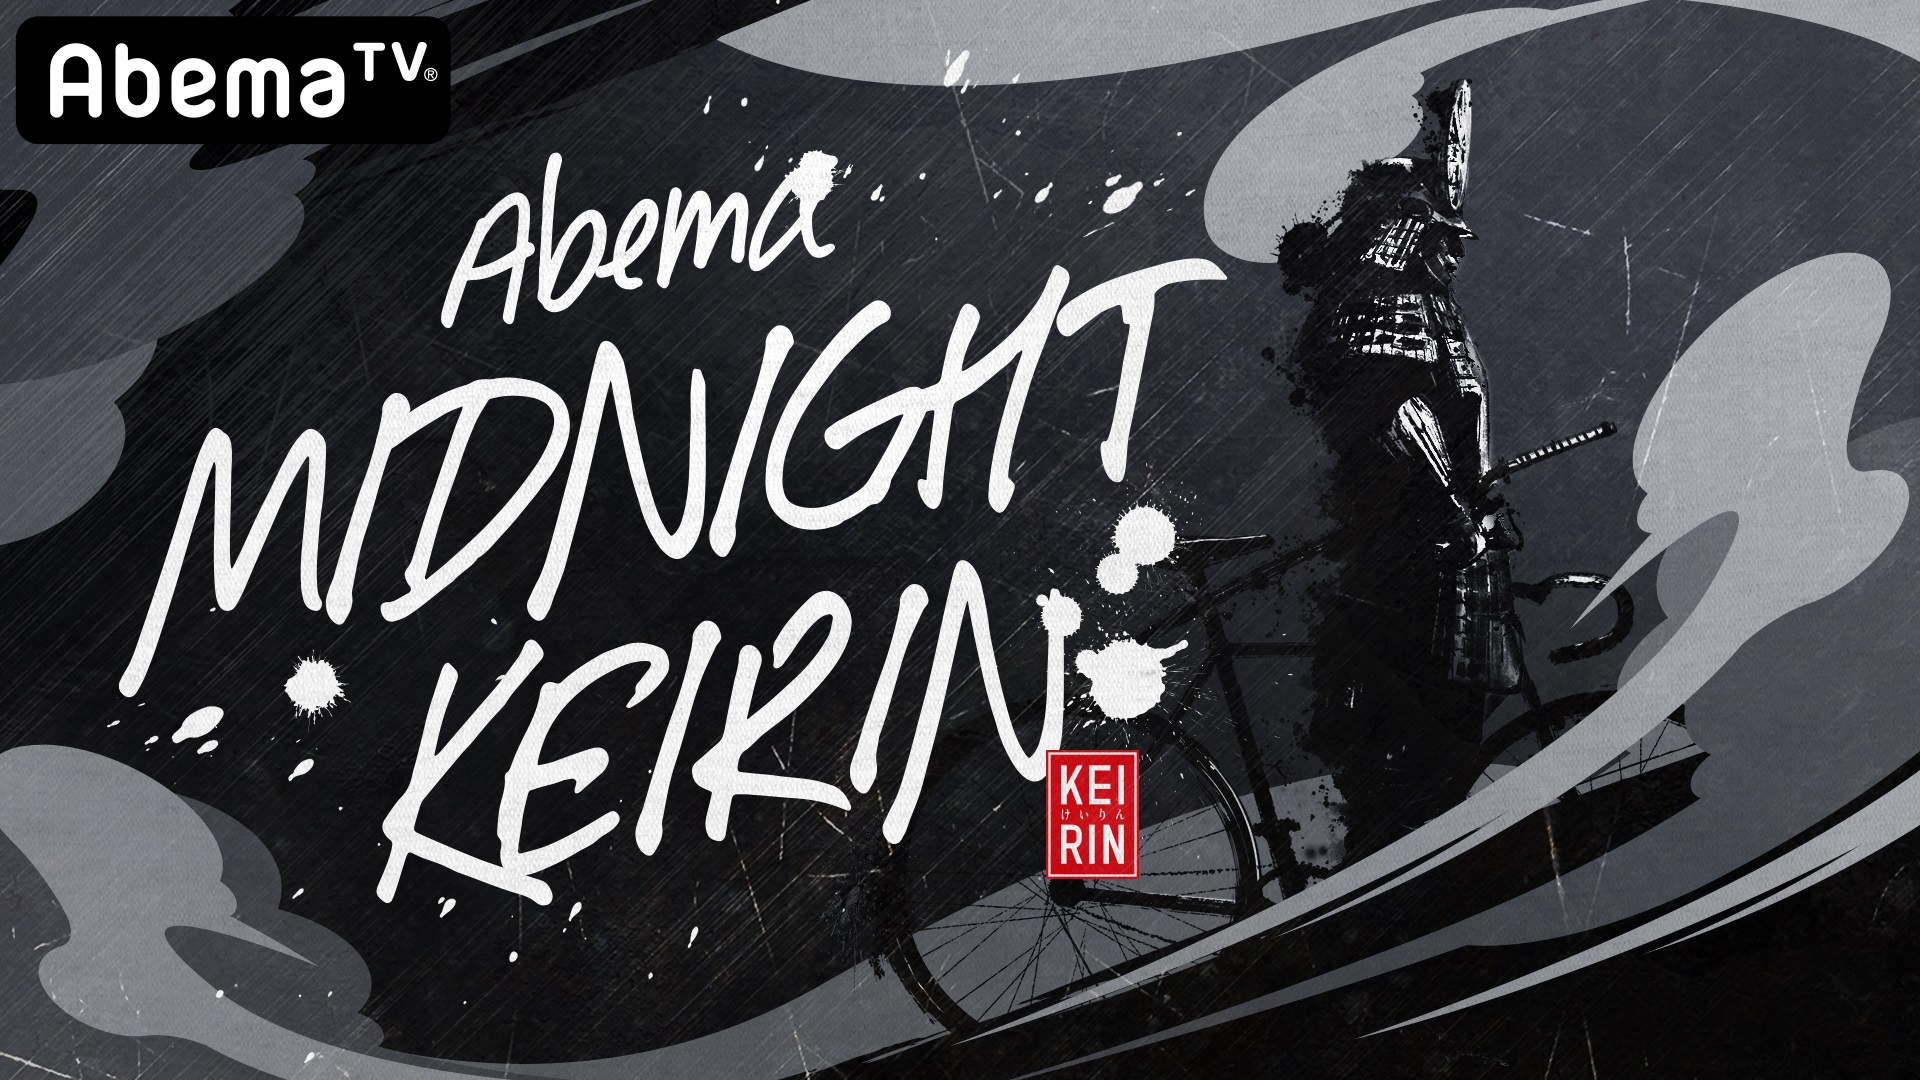 『Abemaミッドナイト競輪』競輪チャンネルにて4月2日より生放送開始!